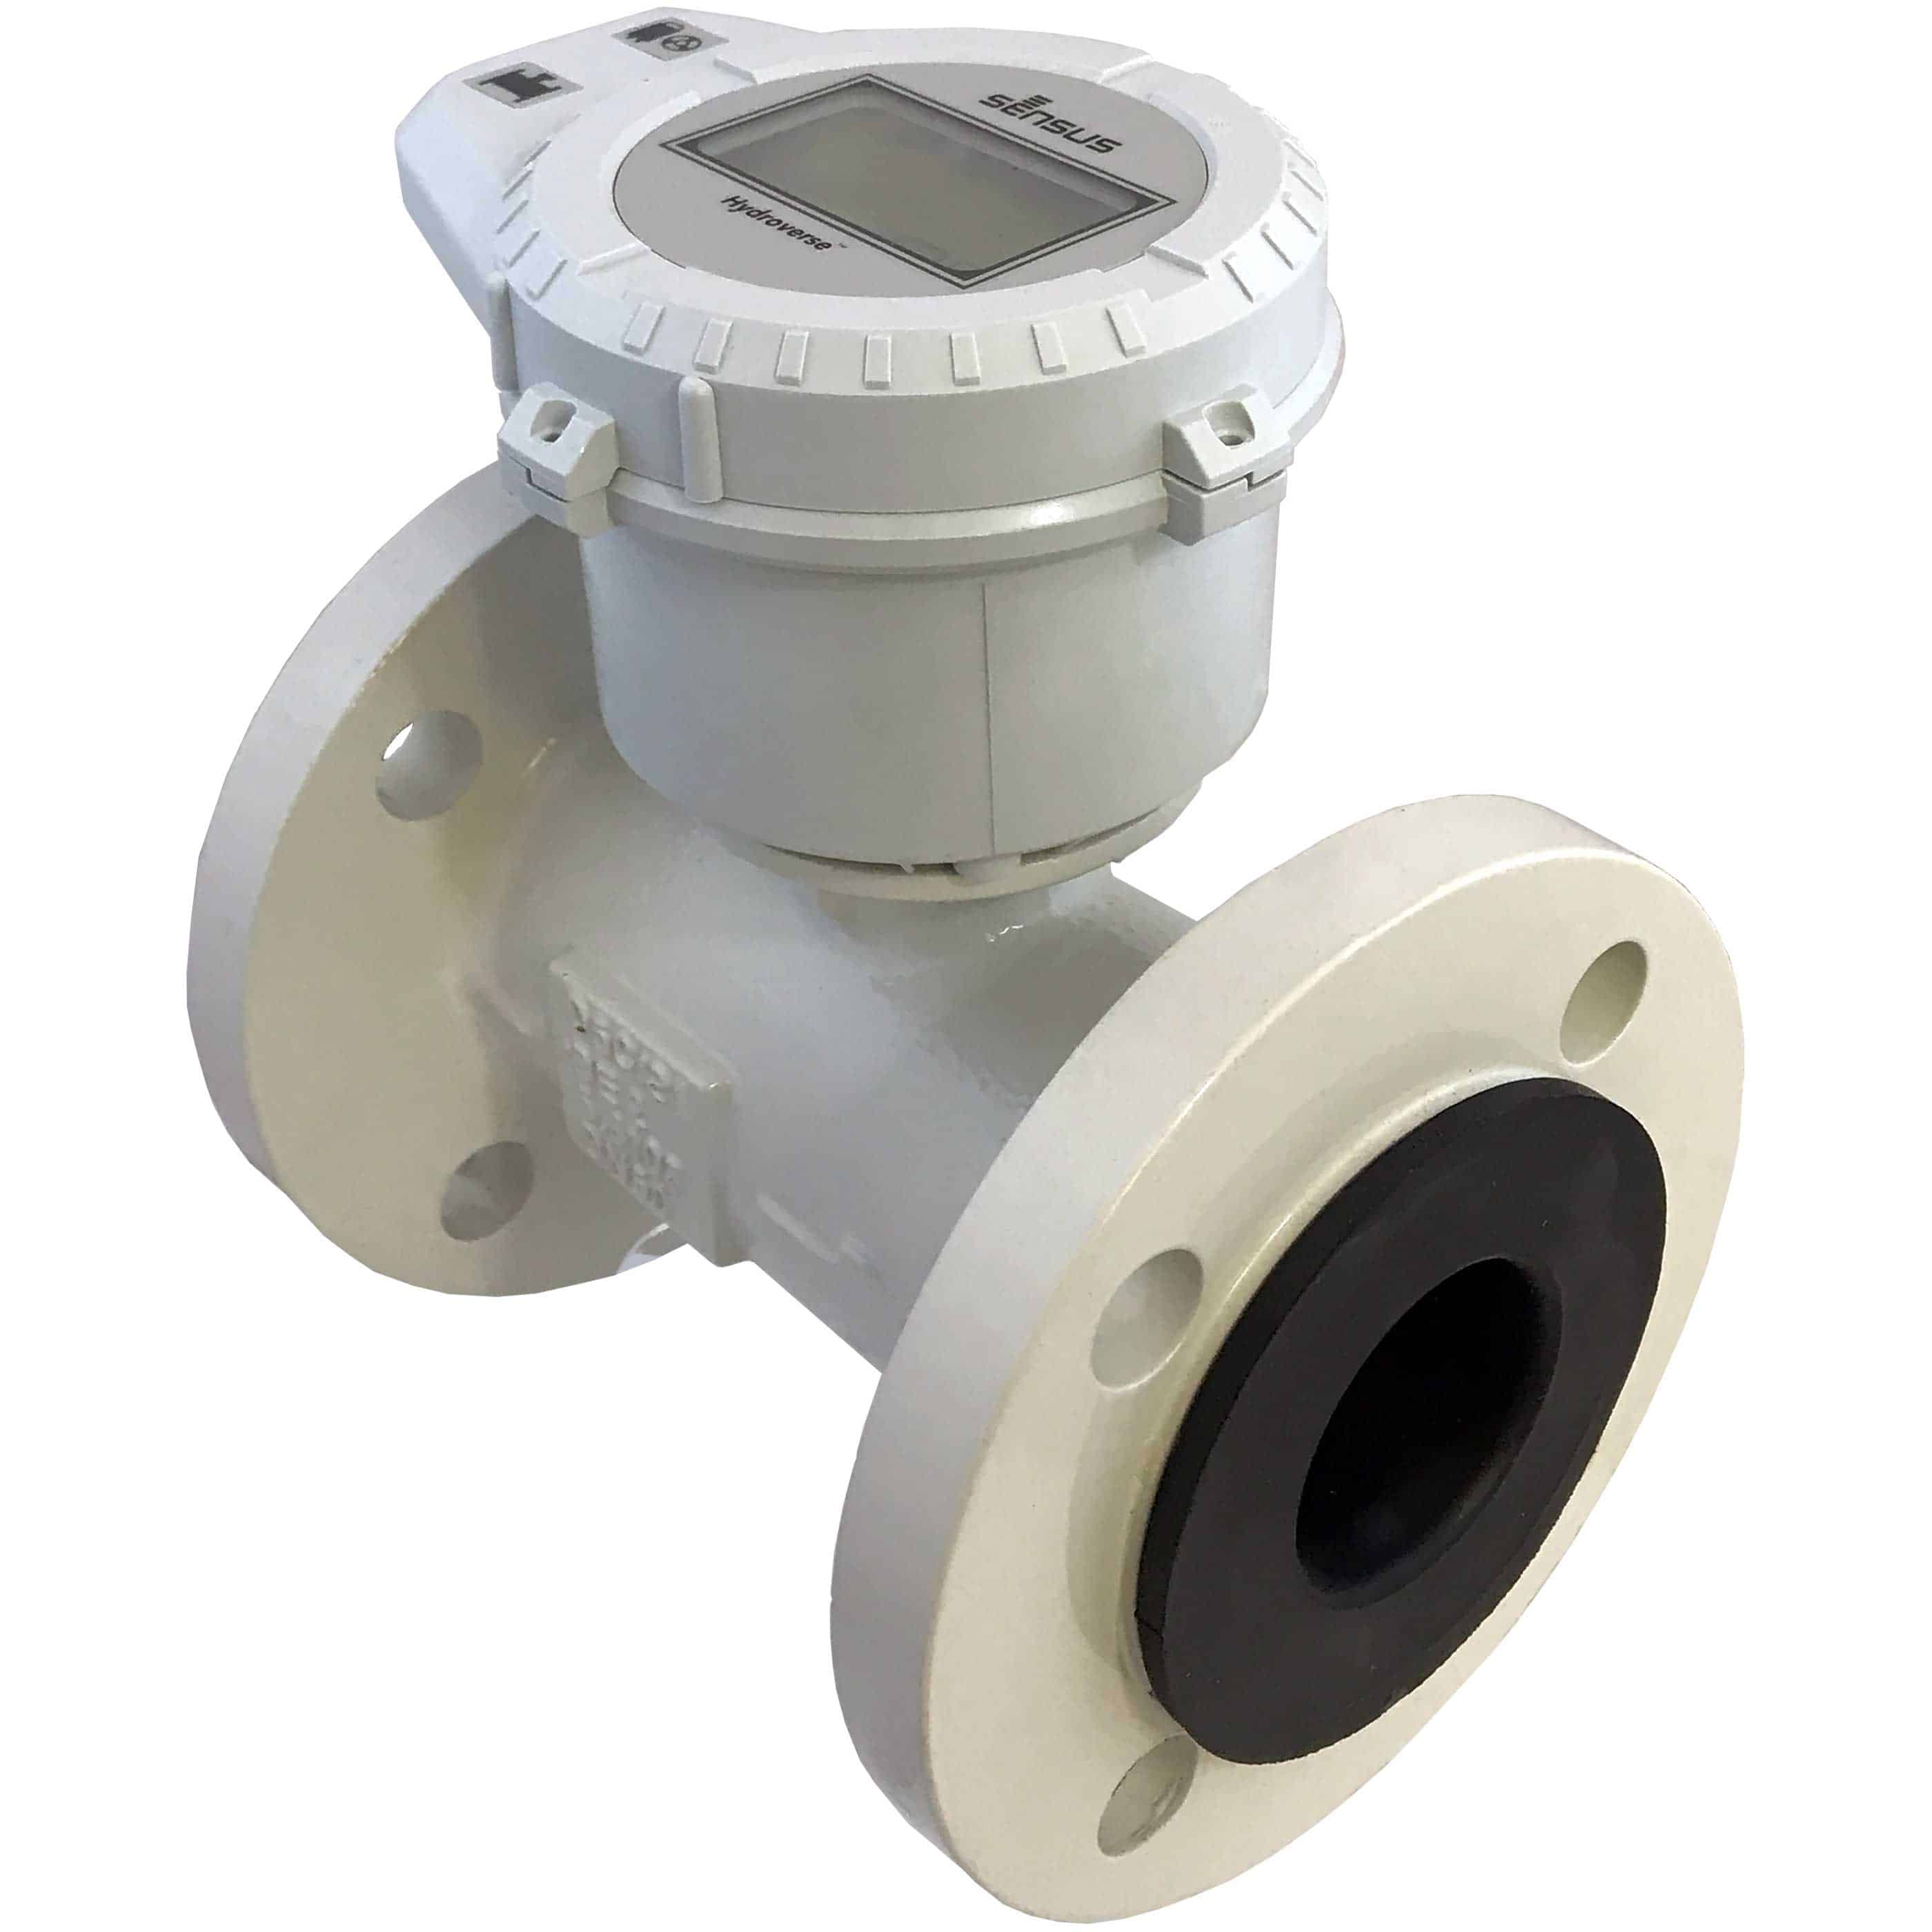 Sensus Hydroverse water meter